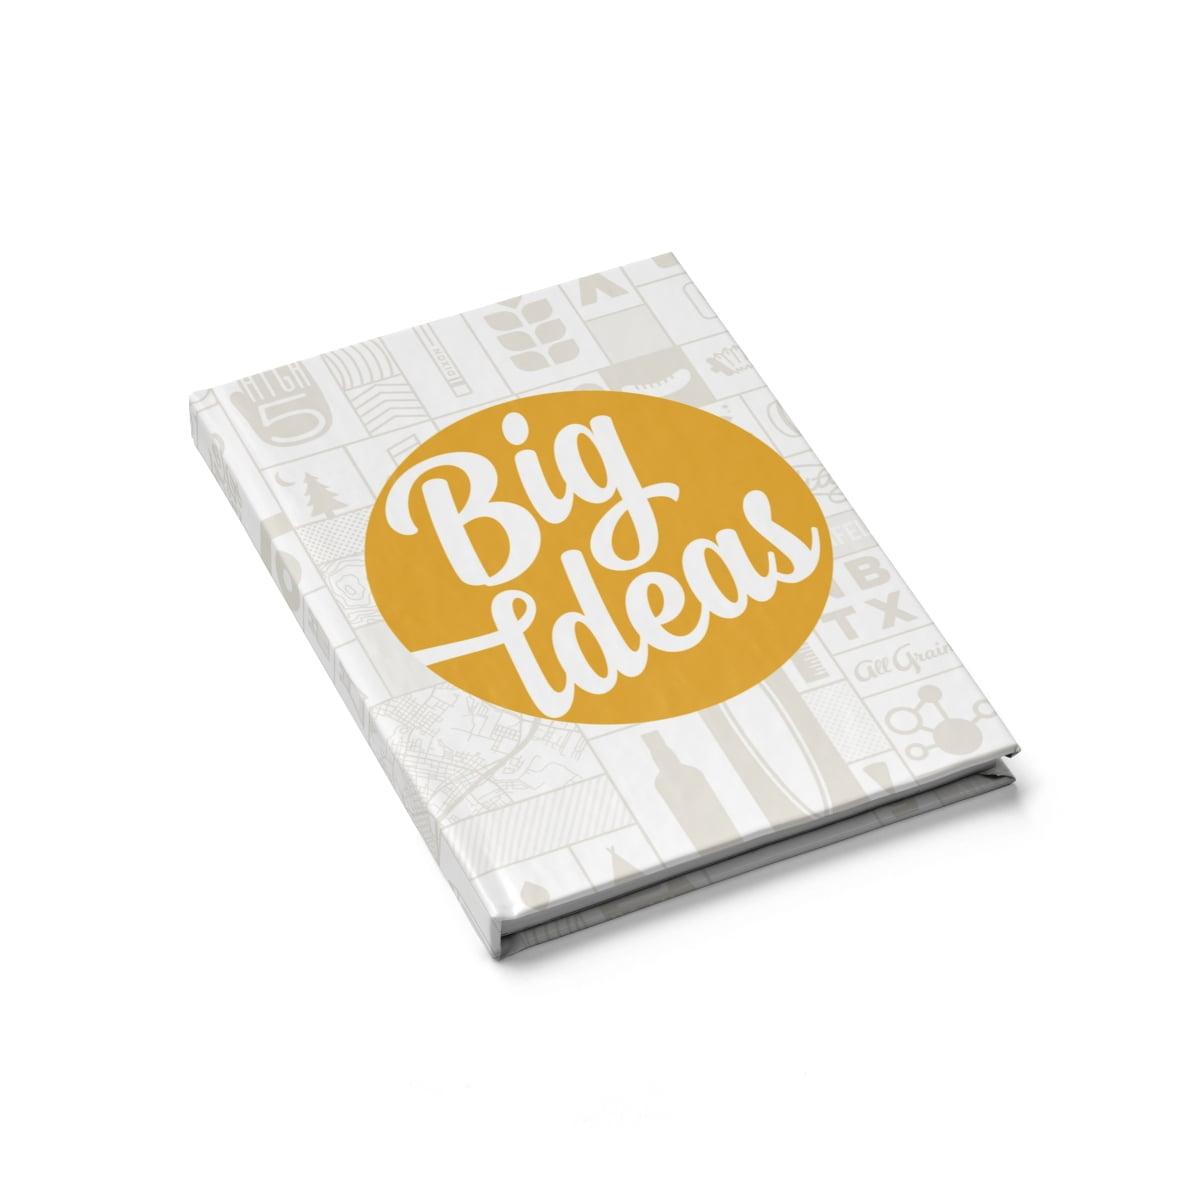 Big Idea's Sketch Book